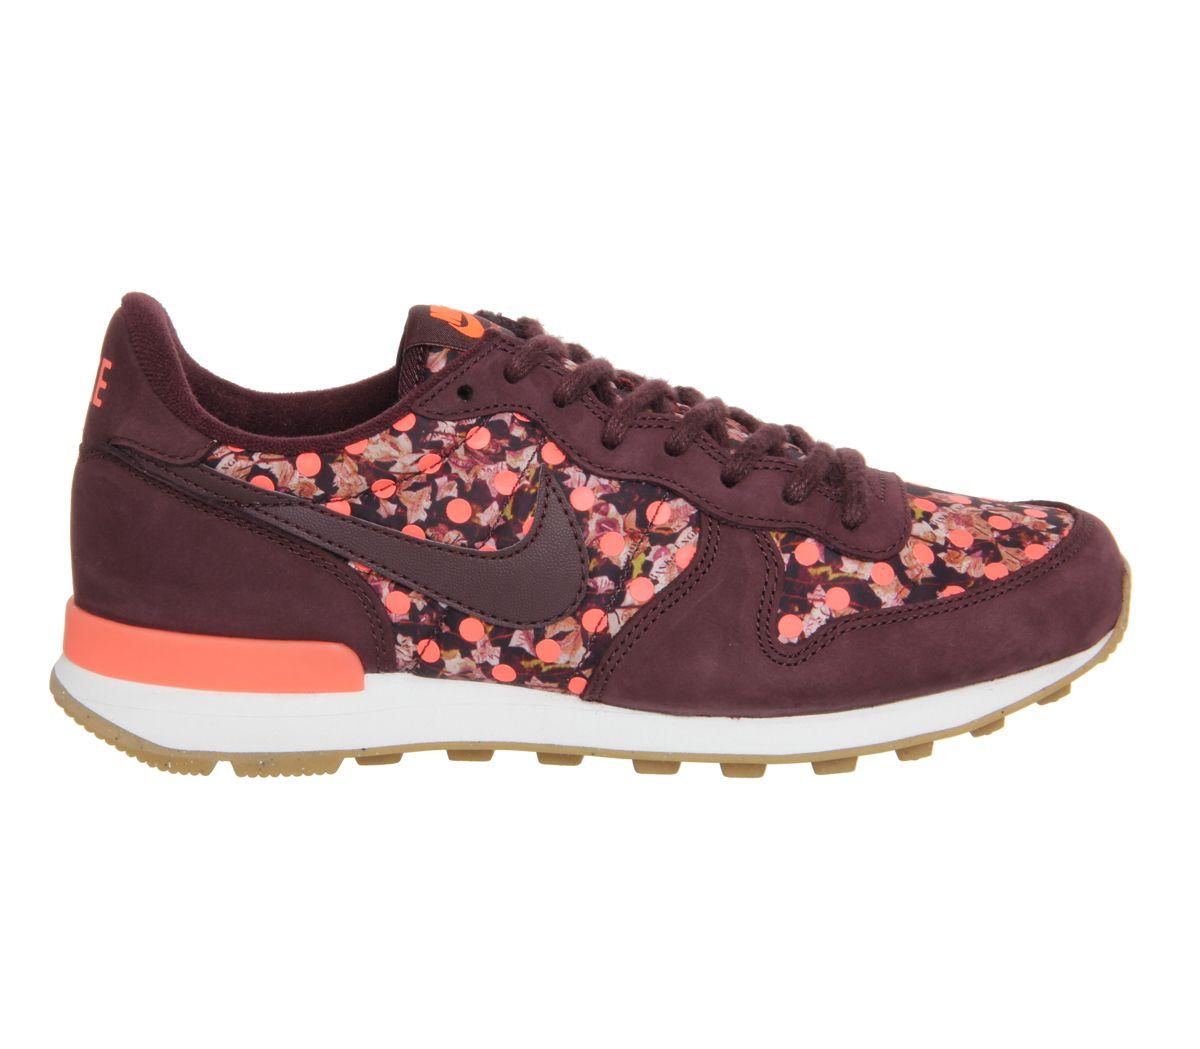 sports shoes 4ad80 be4fe ... release date nike internationalist w liberty deep burgundy bright mango  junior 687e5 66a21